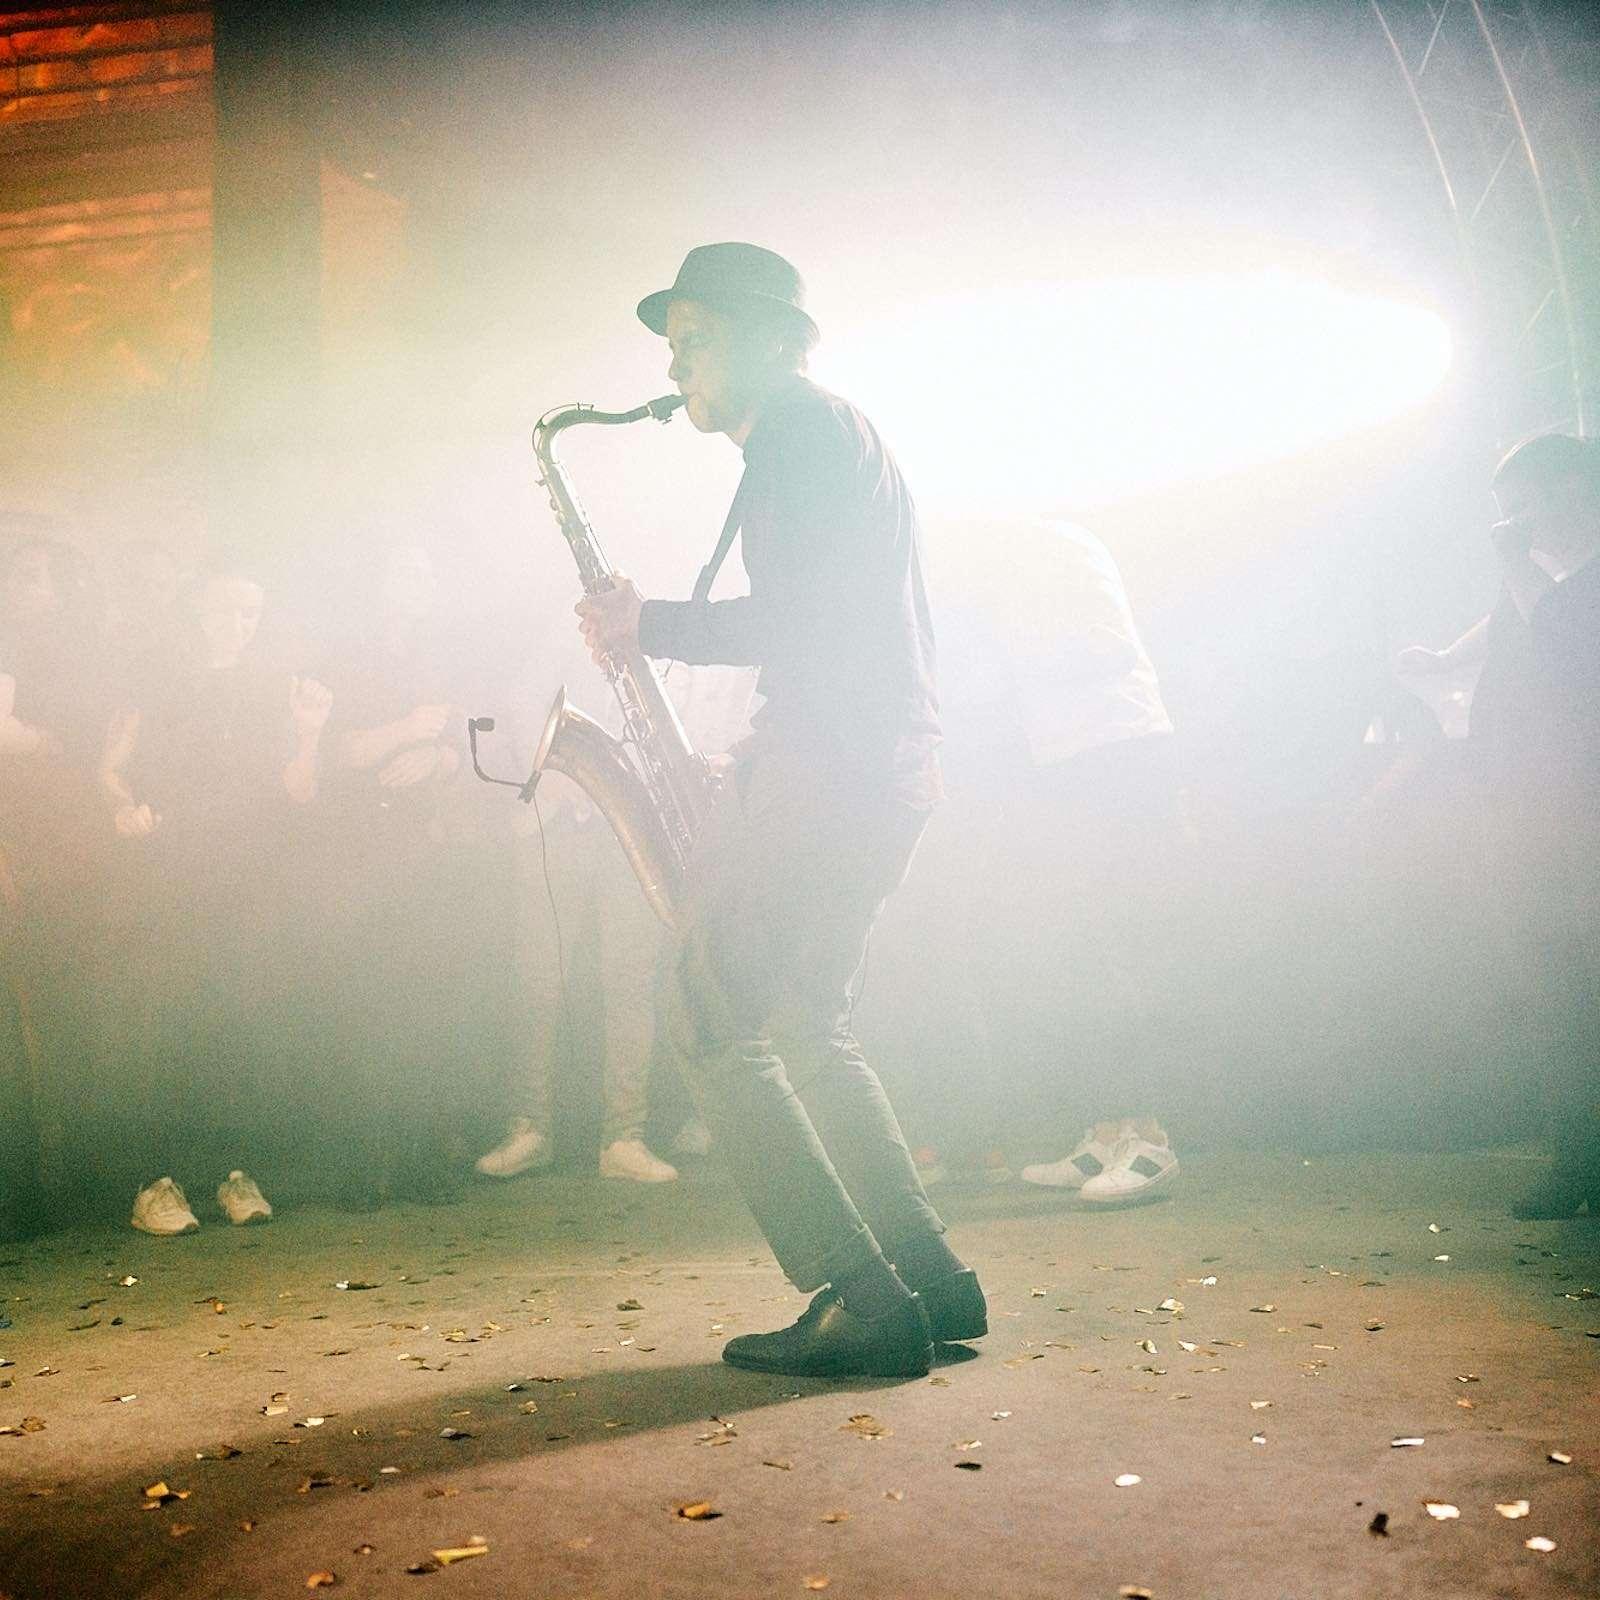 Saxophonist | Saxophon | Hannover | Hochzeit | Buchen | Livemusik | Buchen | House | Electro | Swing | Pop | Party | DJ | Sektempfang | Trauung | Empfang | Messe | Firmenfeier | Mieten | Anfragen | Lehmann | Eventservice